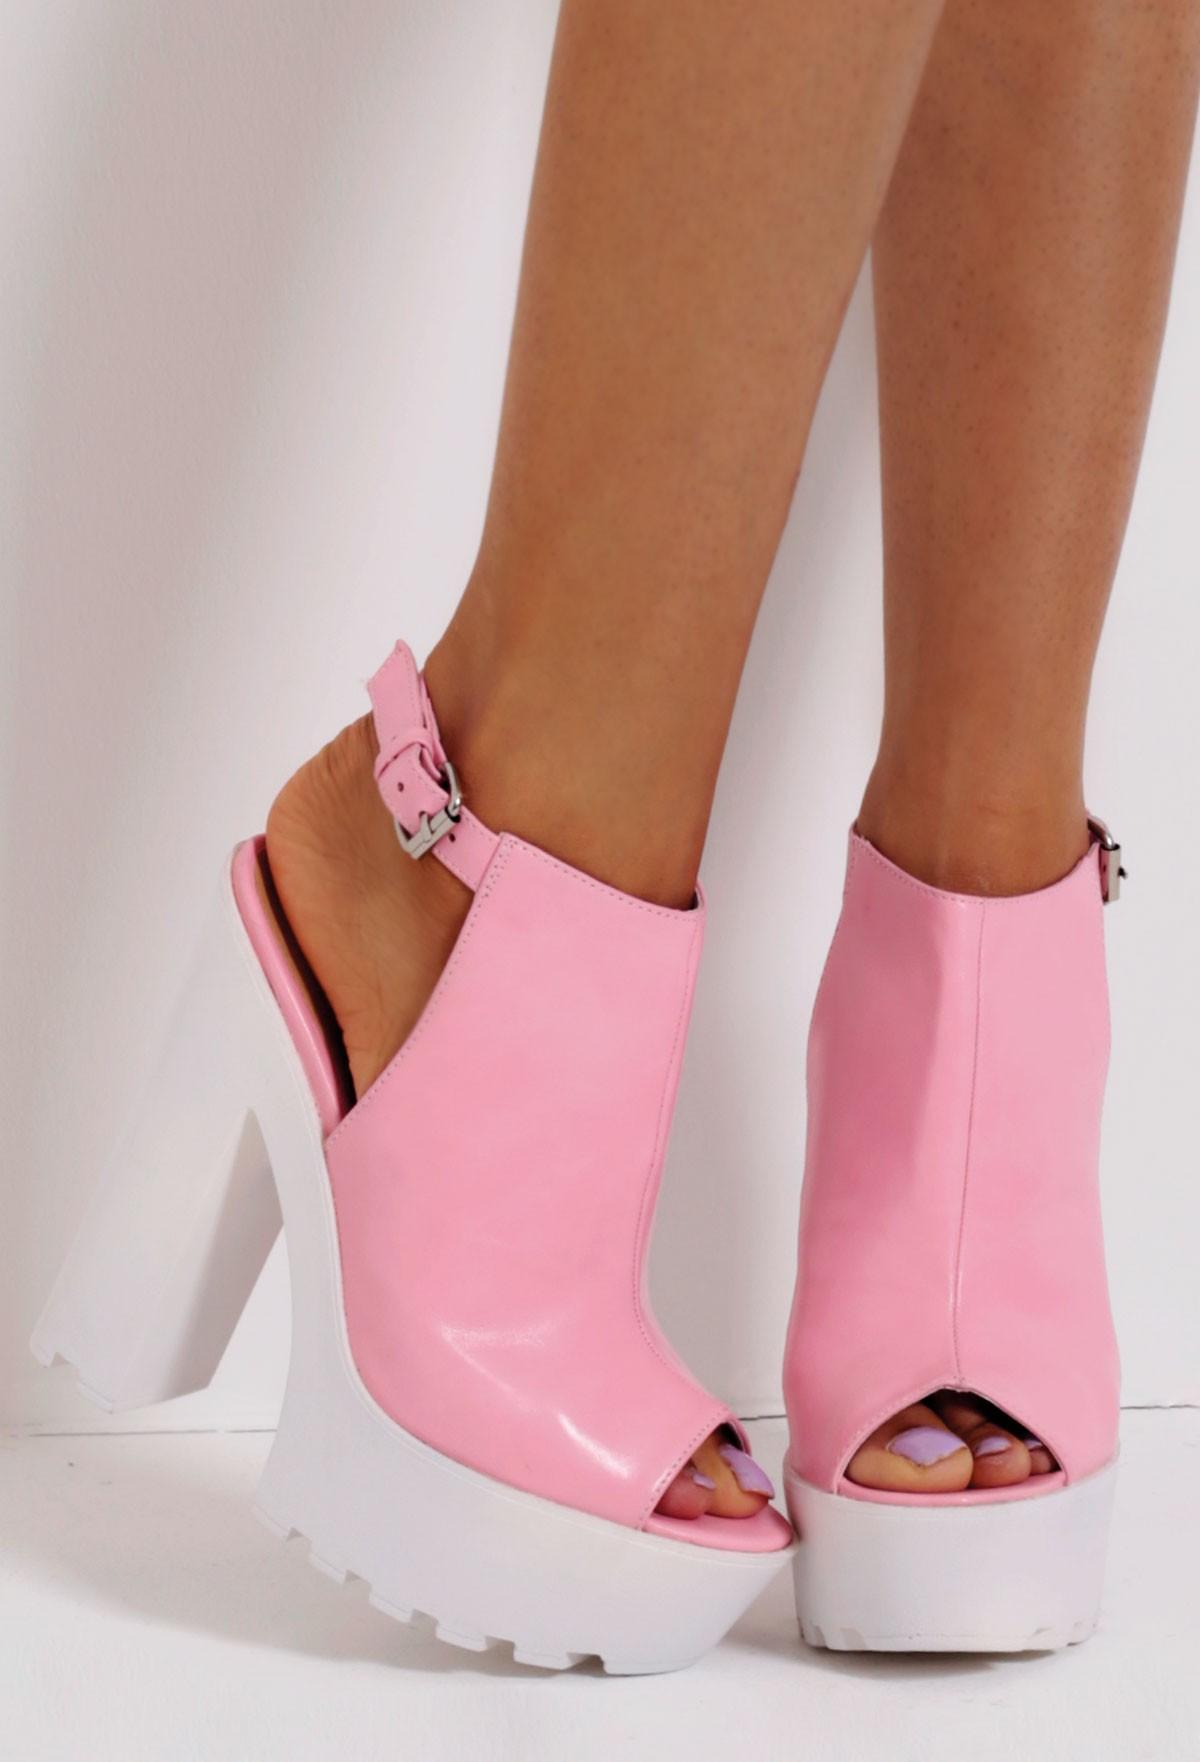 Pink Slingback Tractor Sole Platform Shoes | Pink Boutique